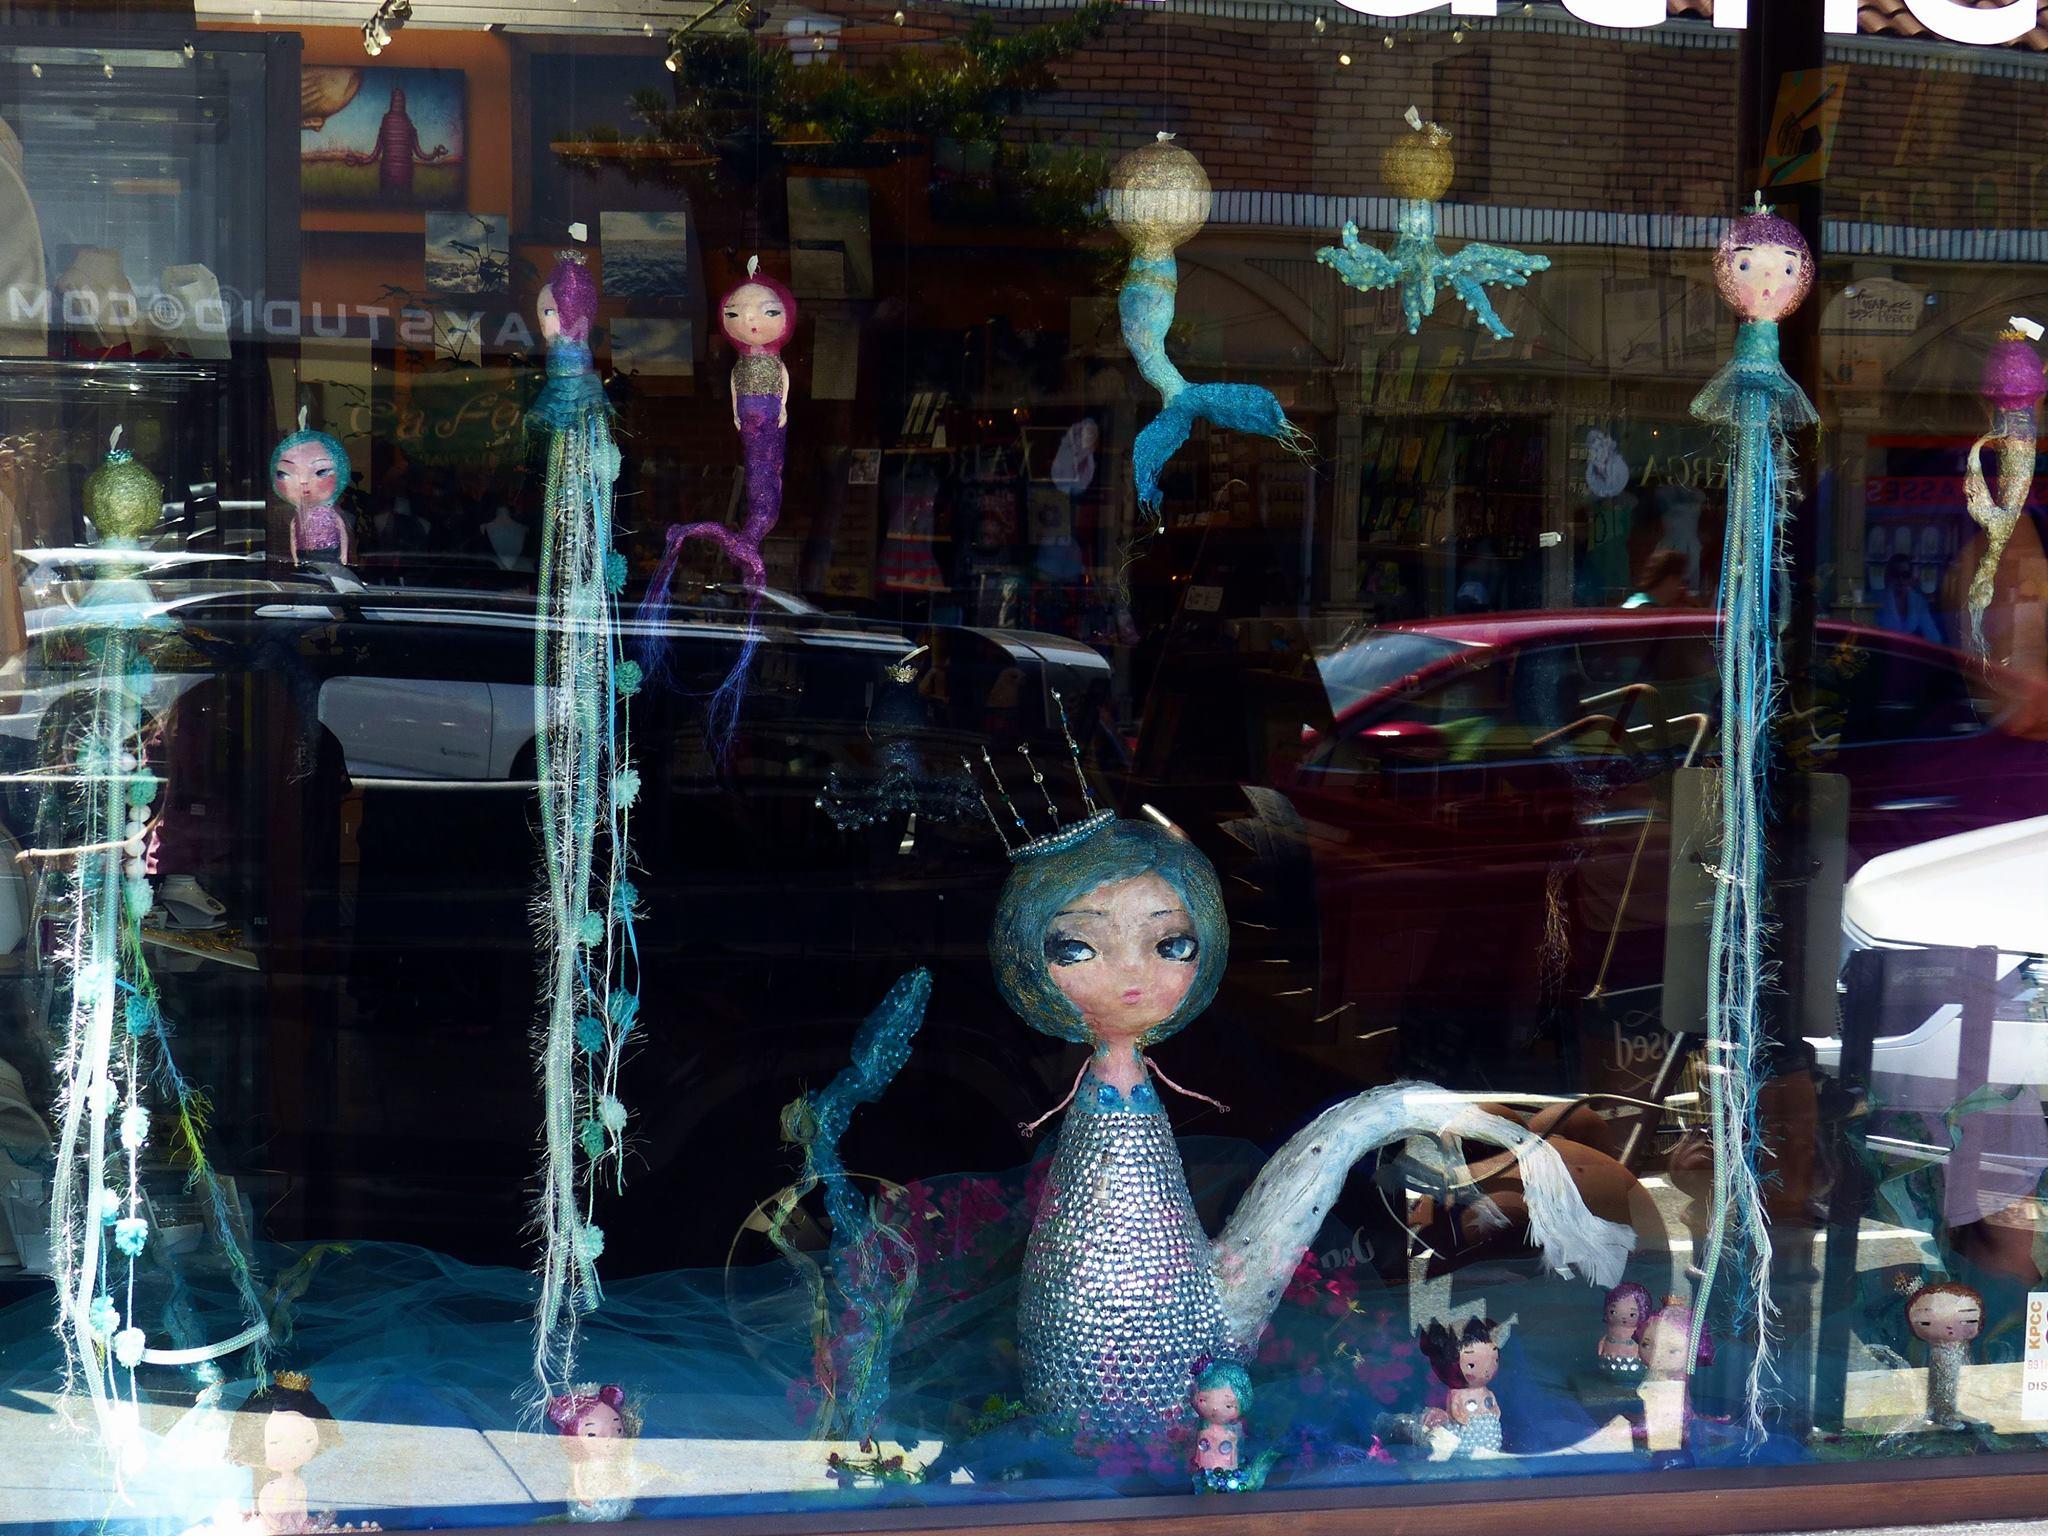 Mernaid window for Mindfulnest Santa Monica, CA